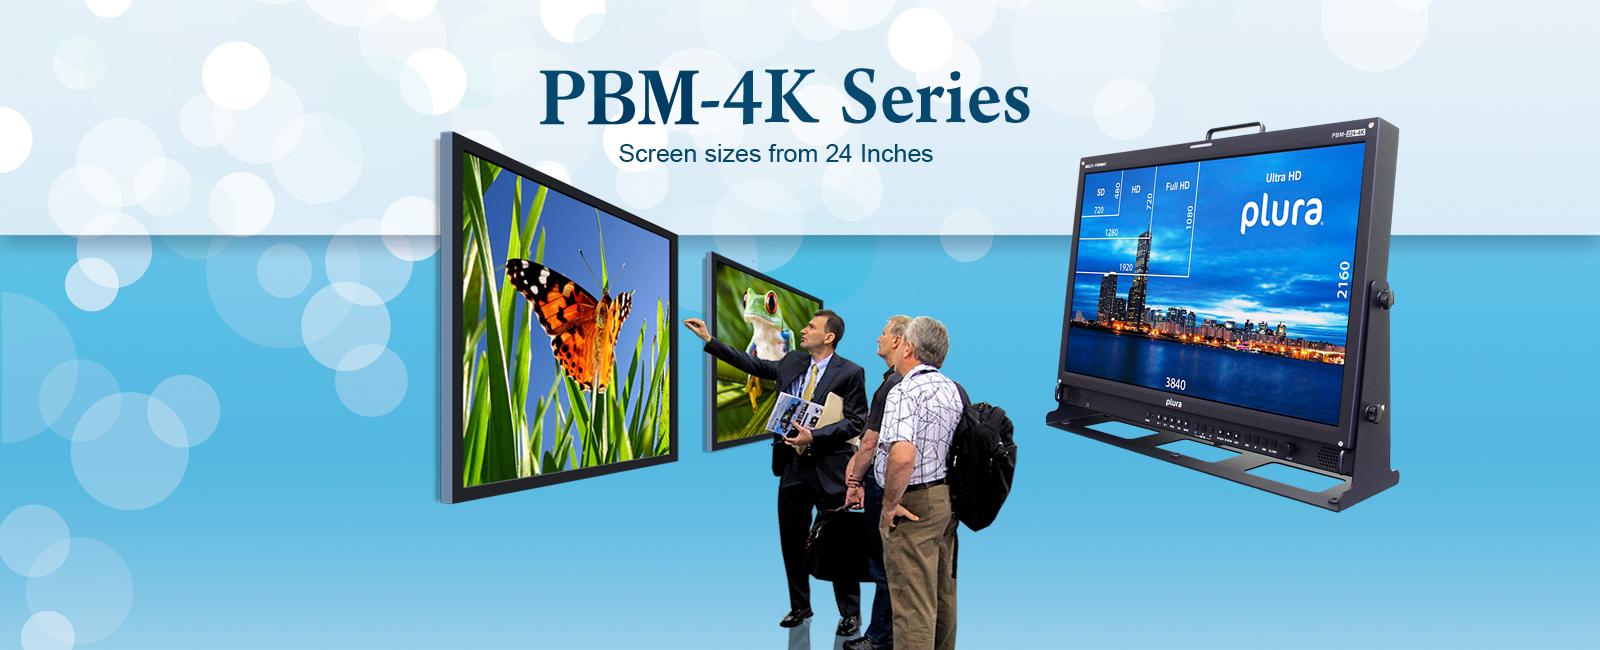 PBM-4K-Series